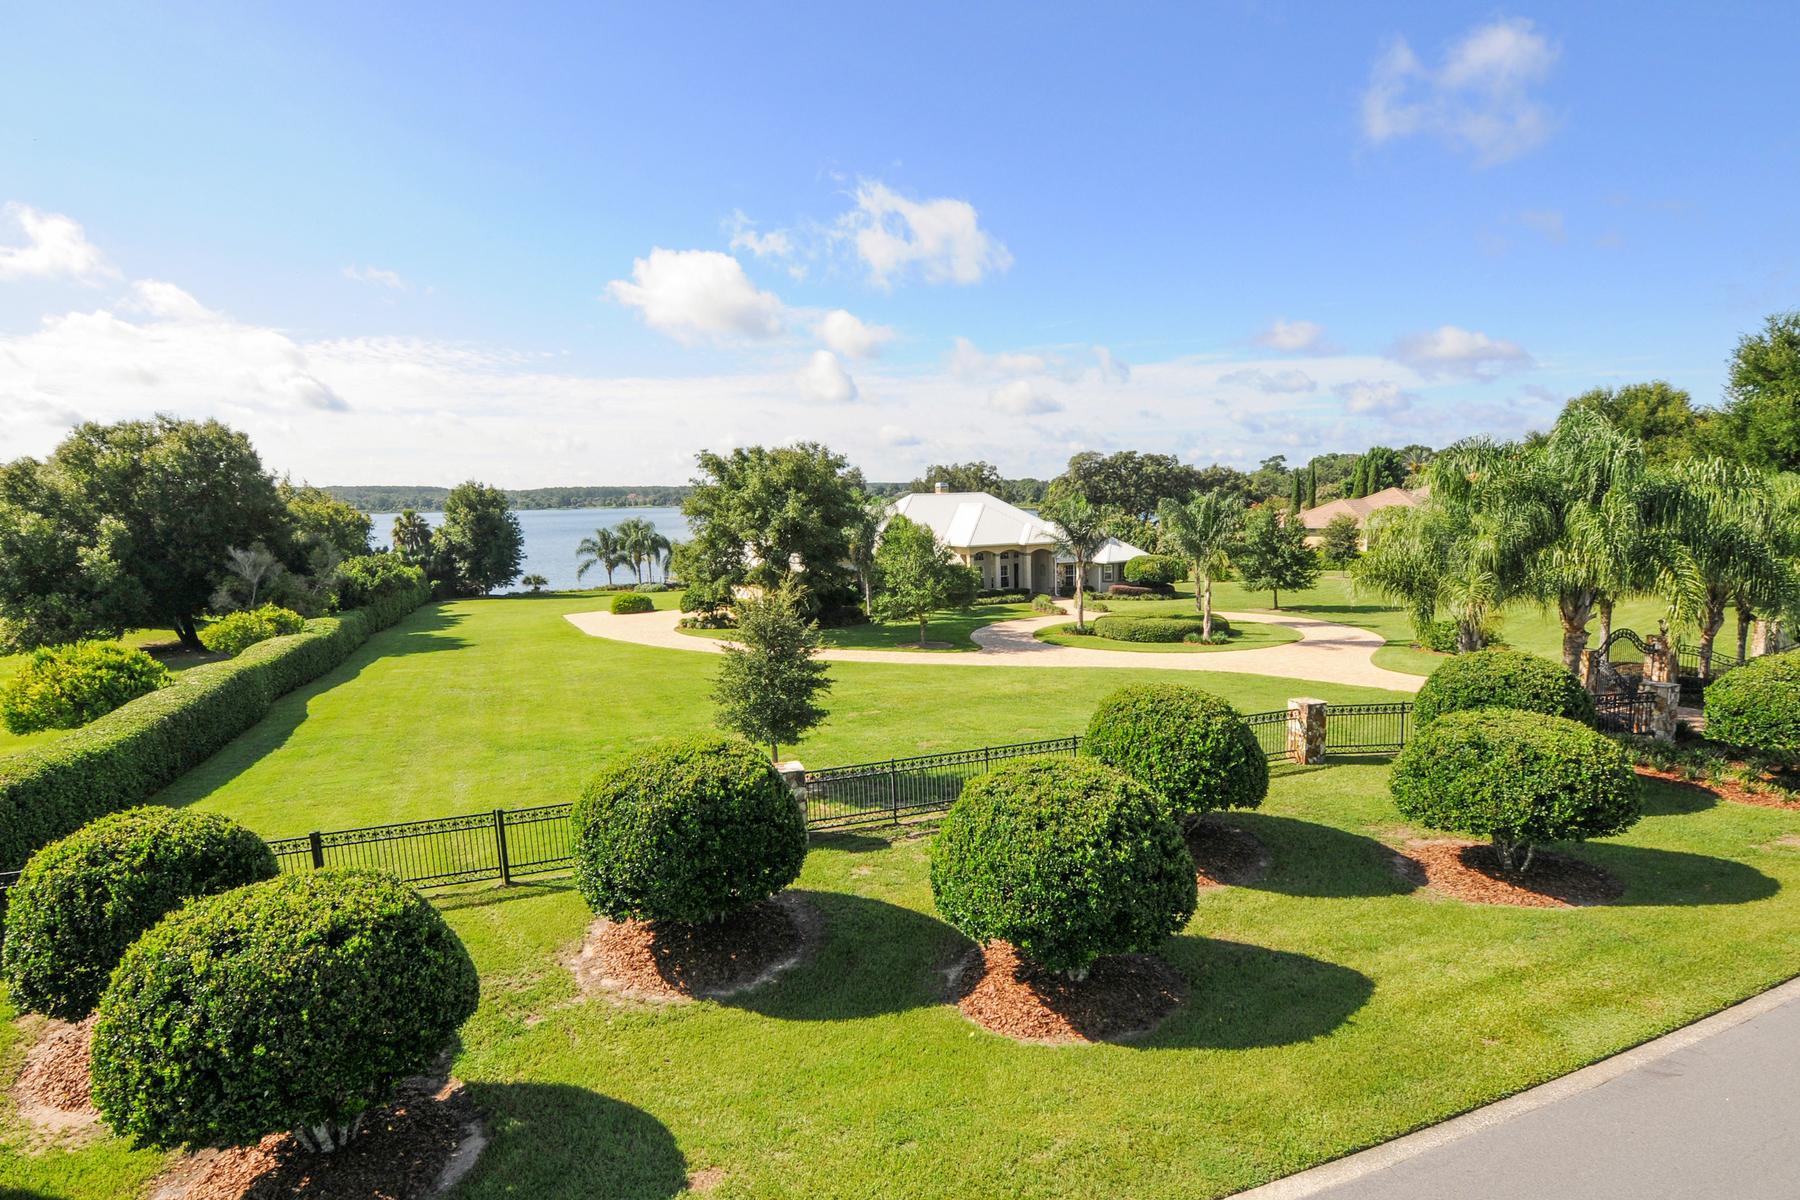 Property For Sale at Umatilla, FL